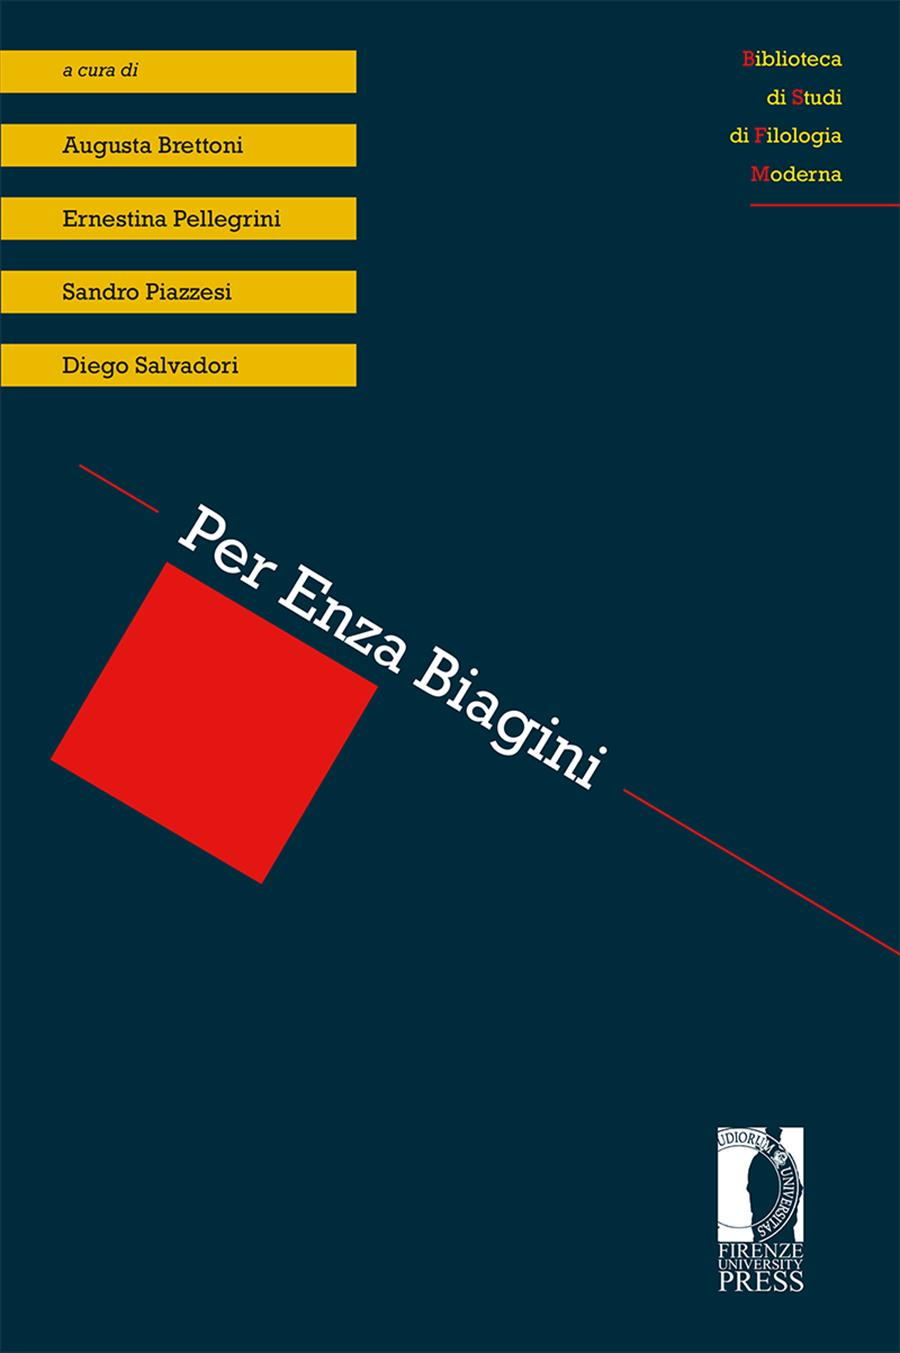 Per Enza Biagini